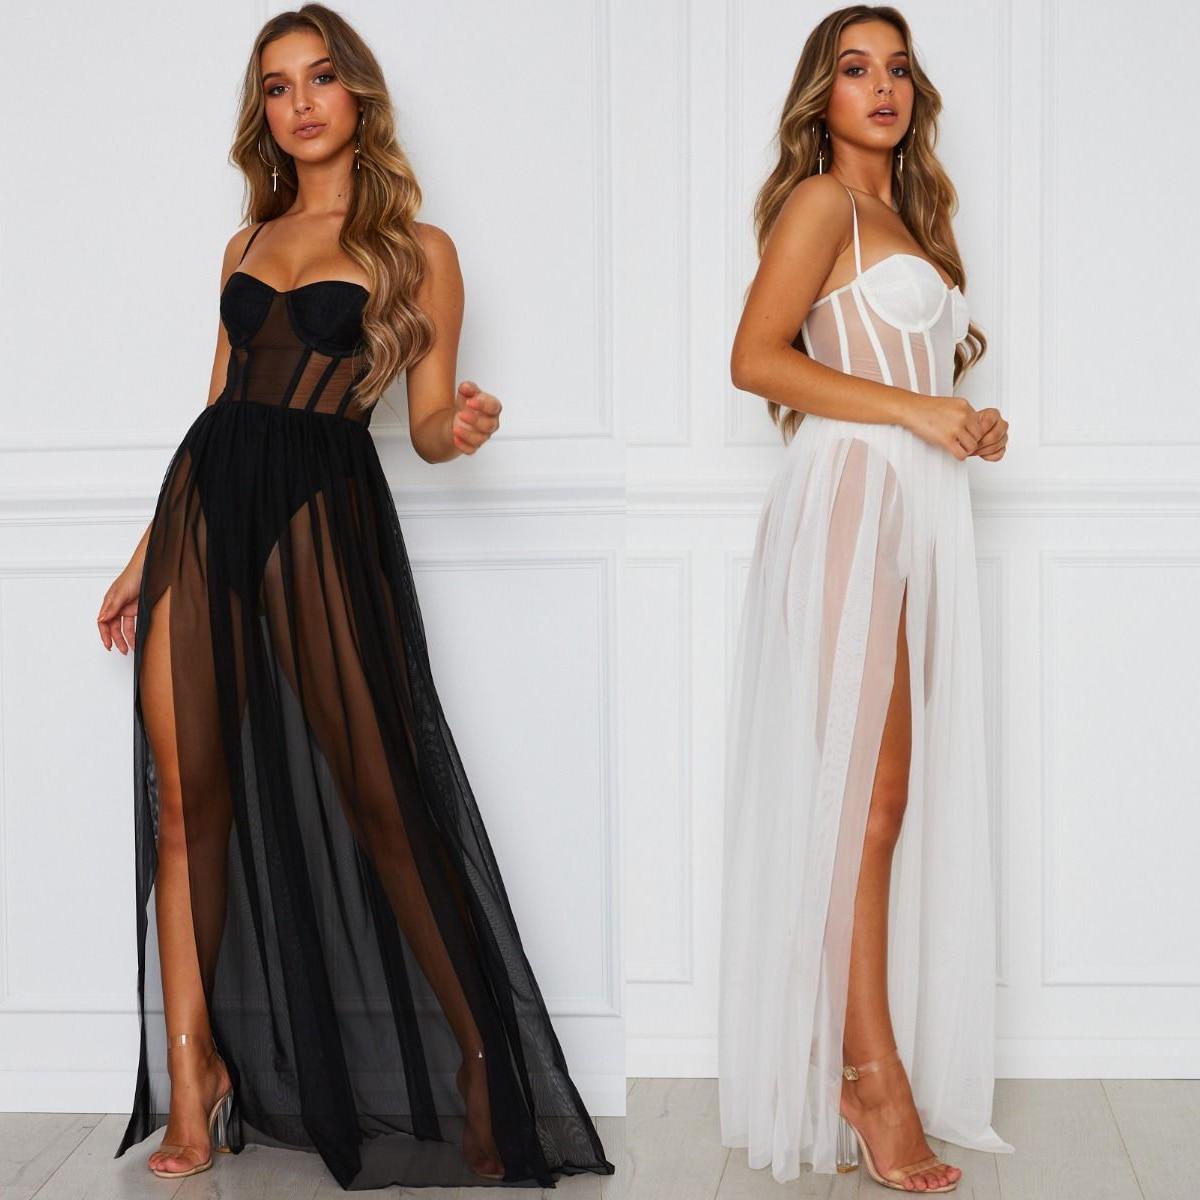 Push Up Padded Sexy Dress Women See-through Mesh Slip Dress High Split Leg High Waist Night Party Fashion Queen Maxi Dress 2019